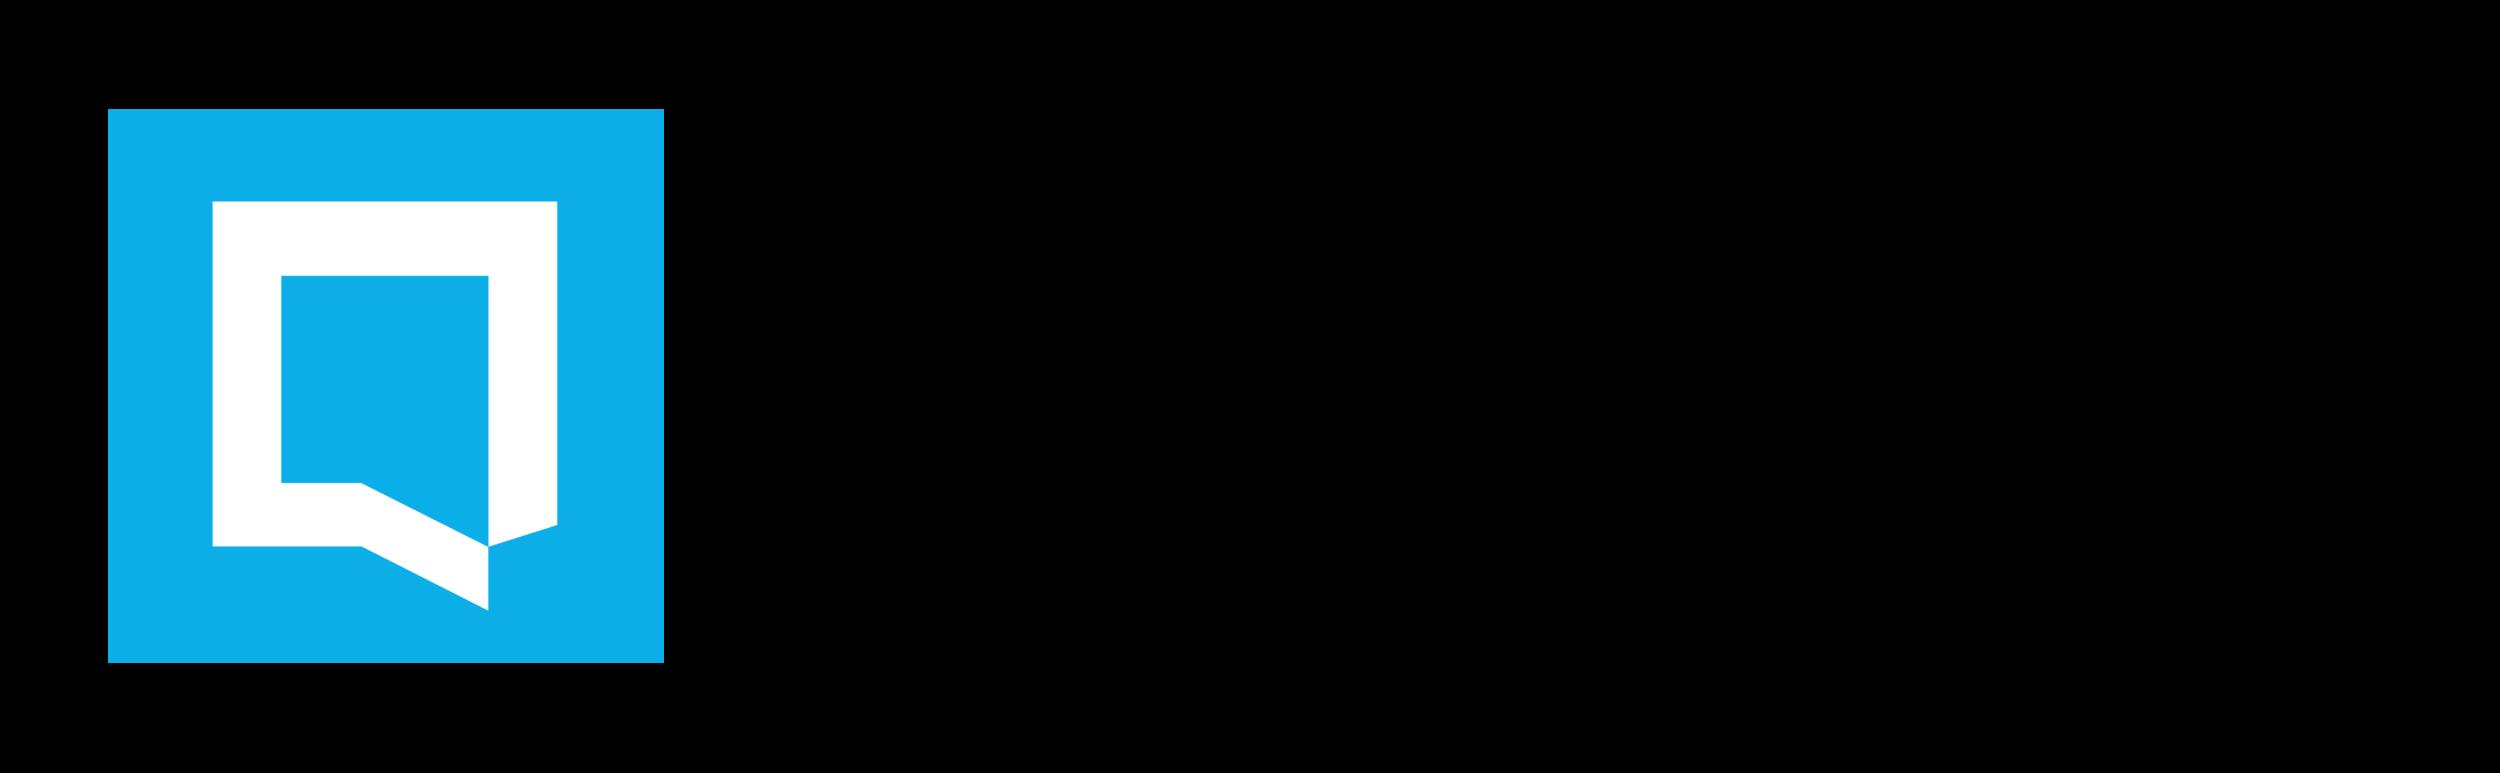 mapiq-logo_png.png